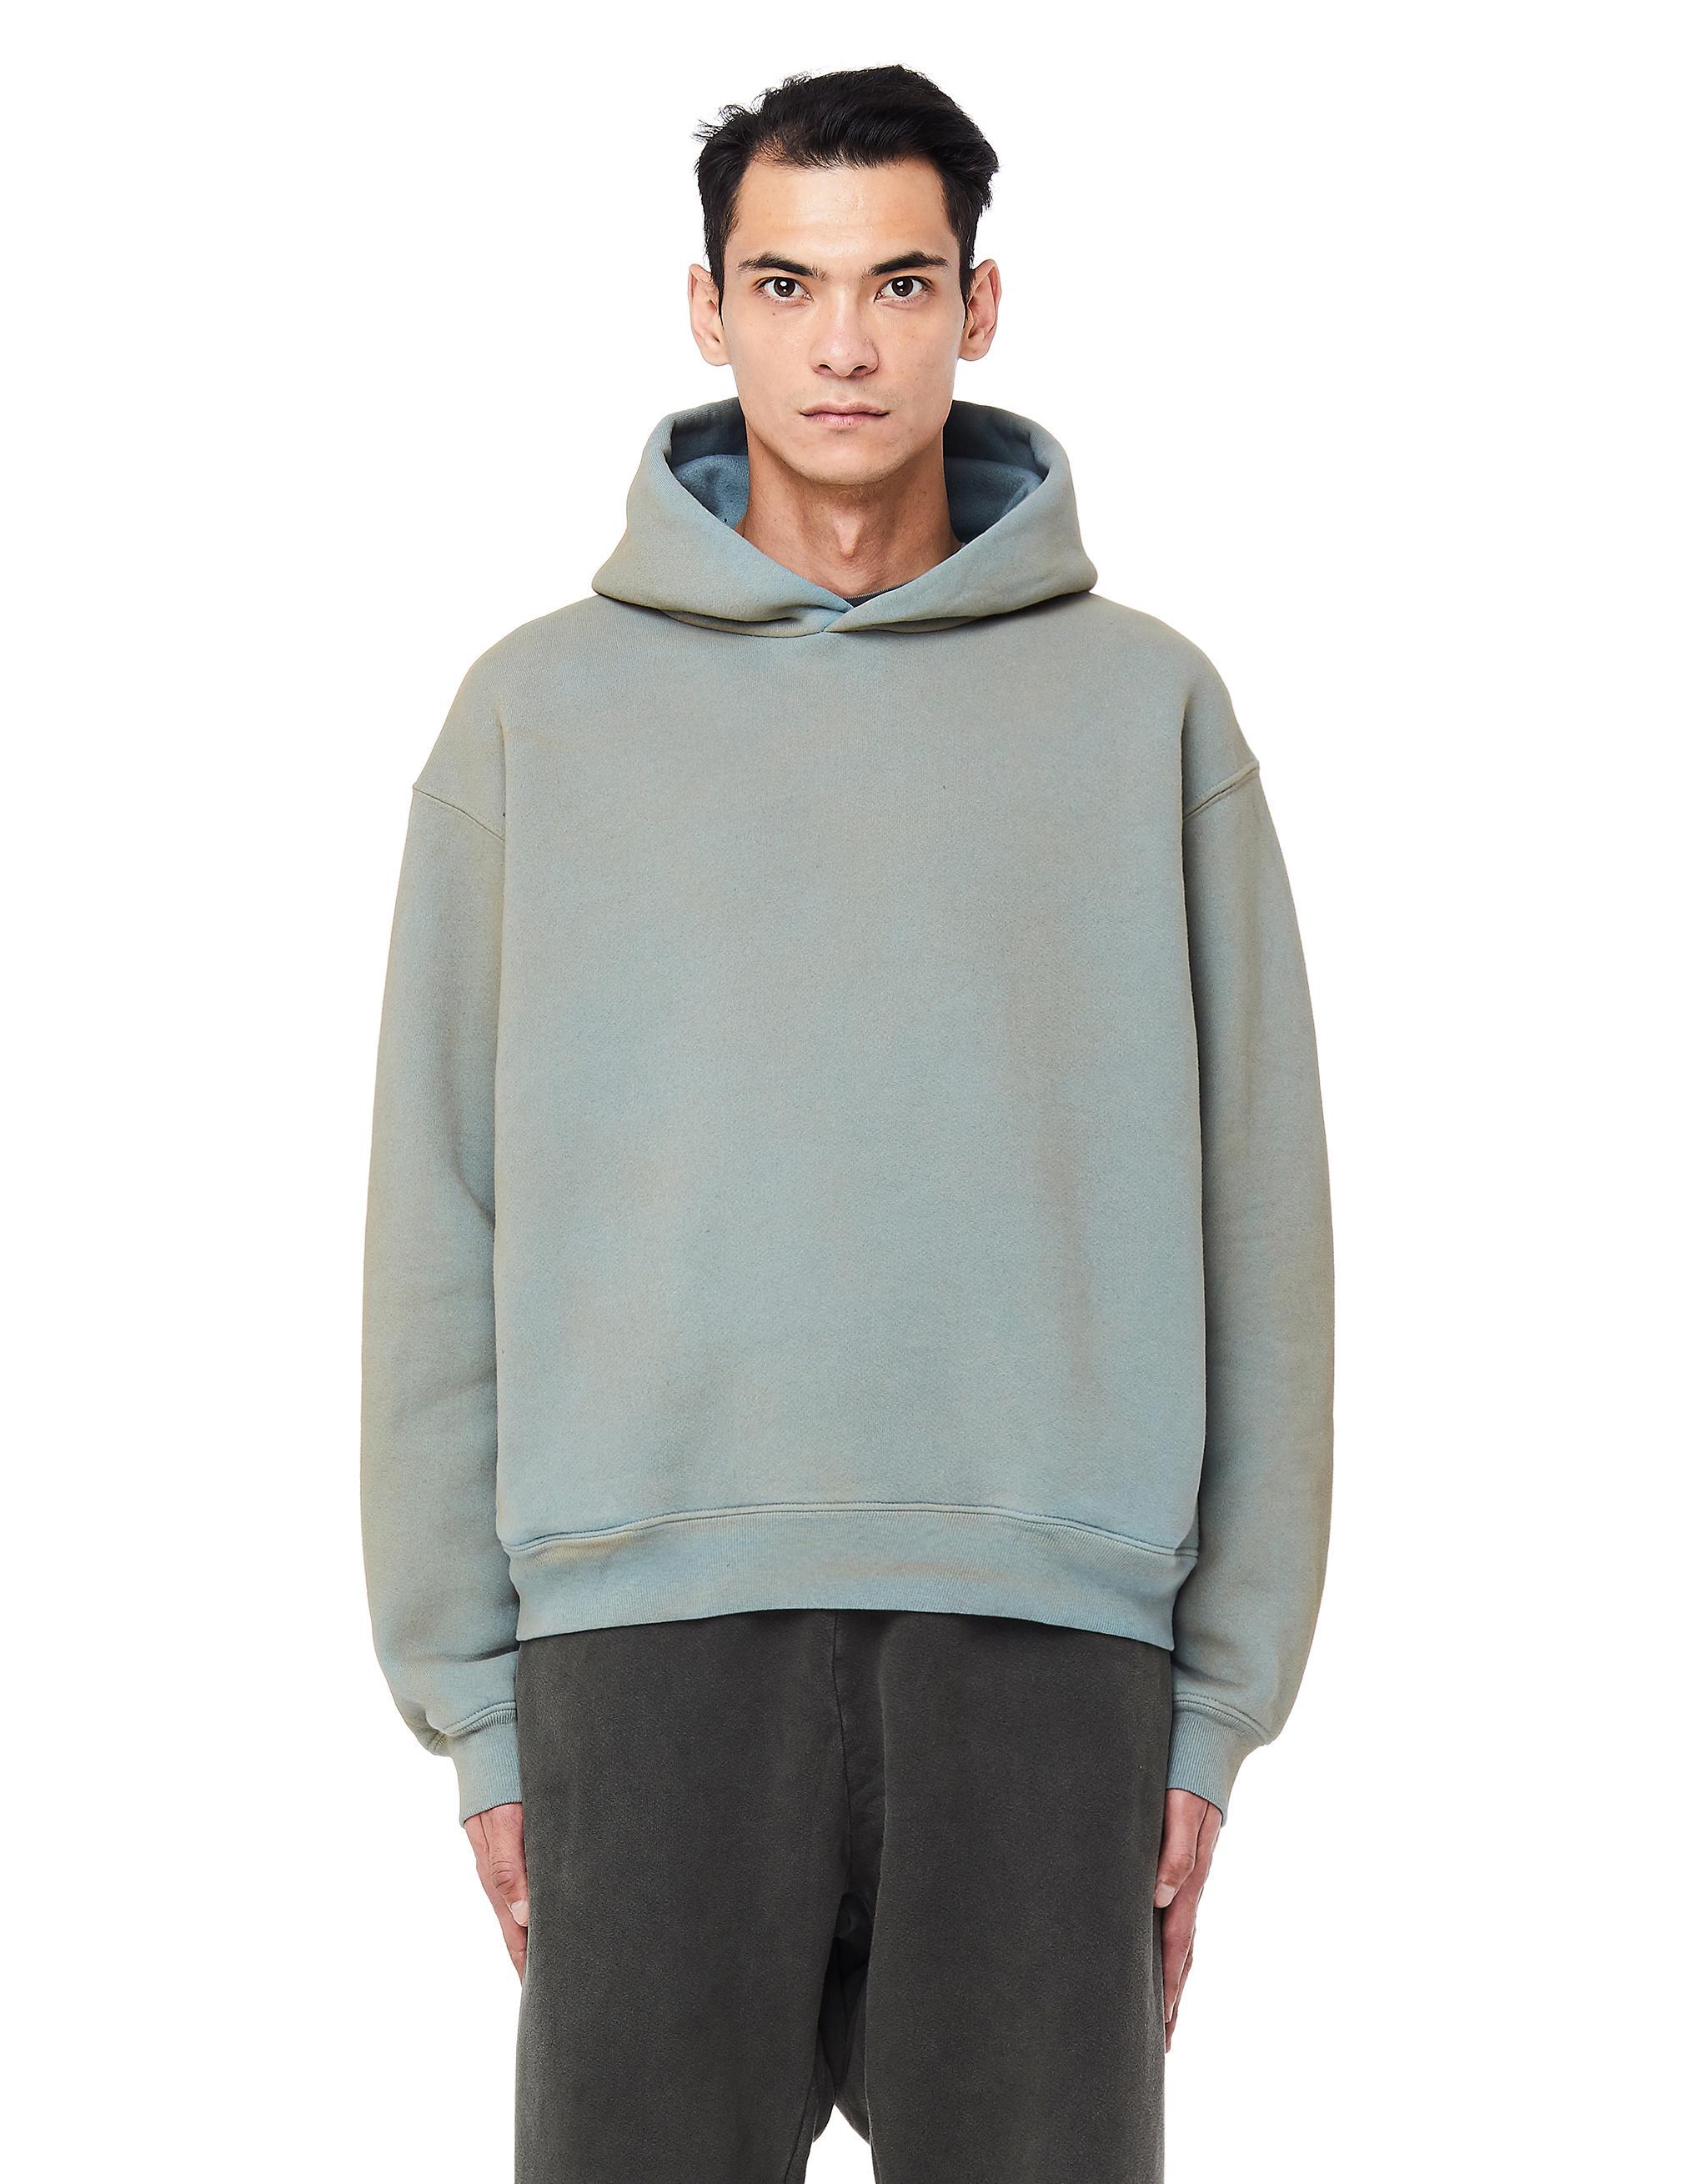 34347e651 Yeezy Glacier Cotton Hoodie in Blue for Men - Lyst